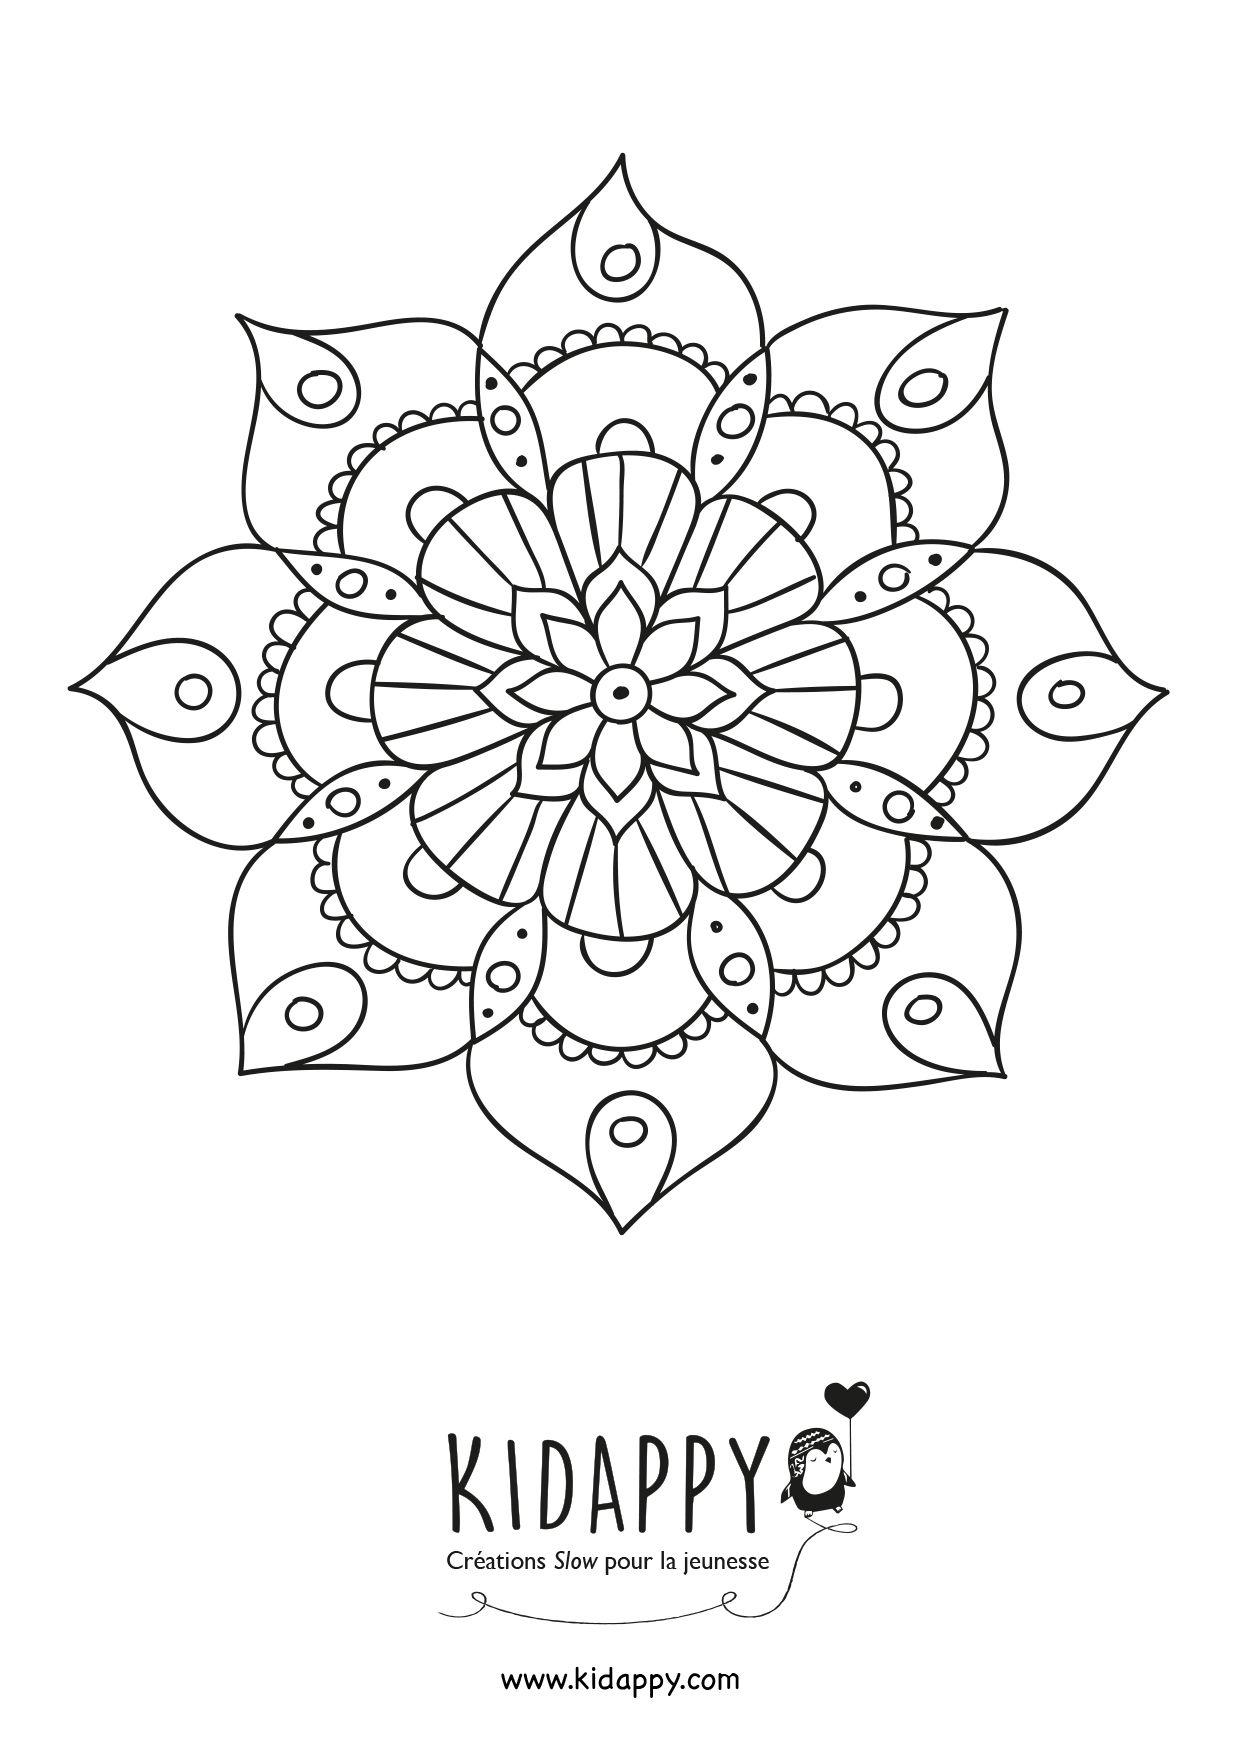 Mandalas Kidappy 03 Desenhos De Mandala Simples Mandala Simples Desenhos De Mandalas